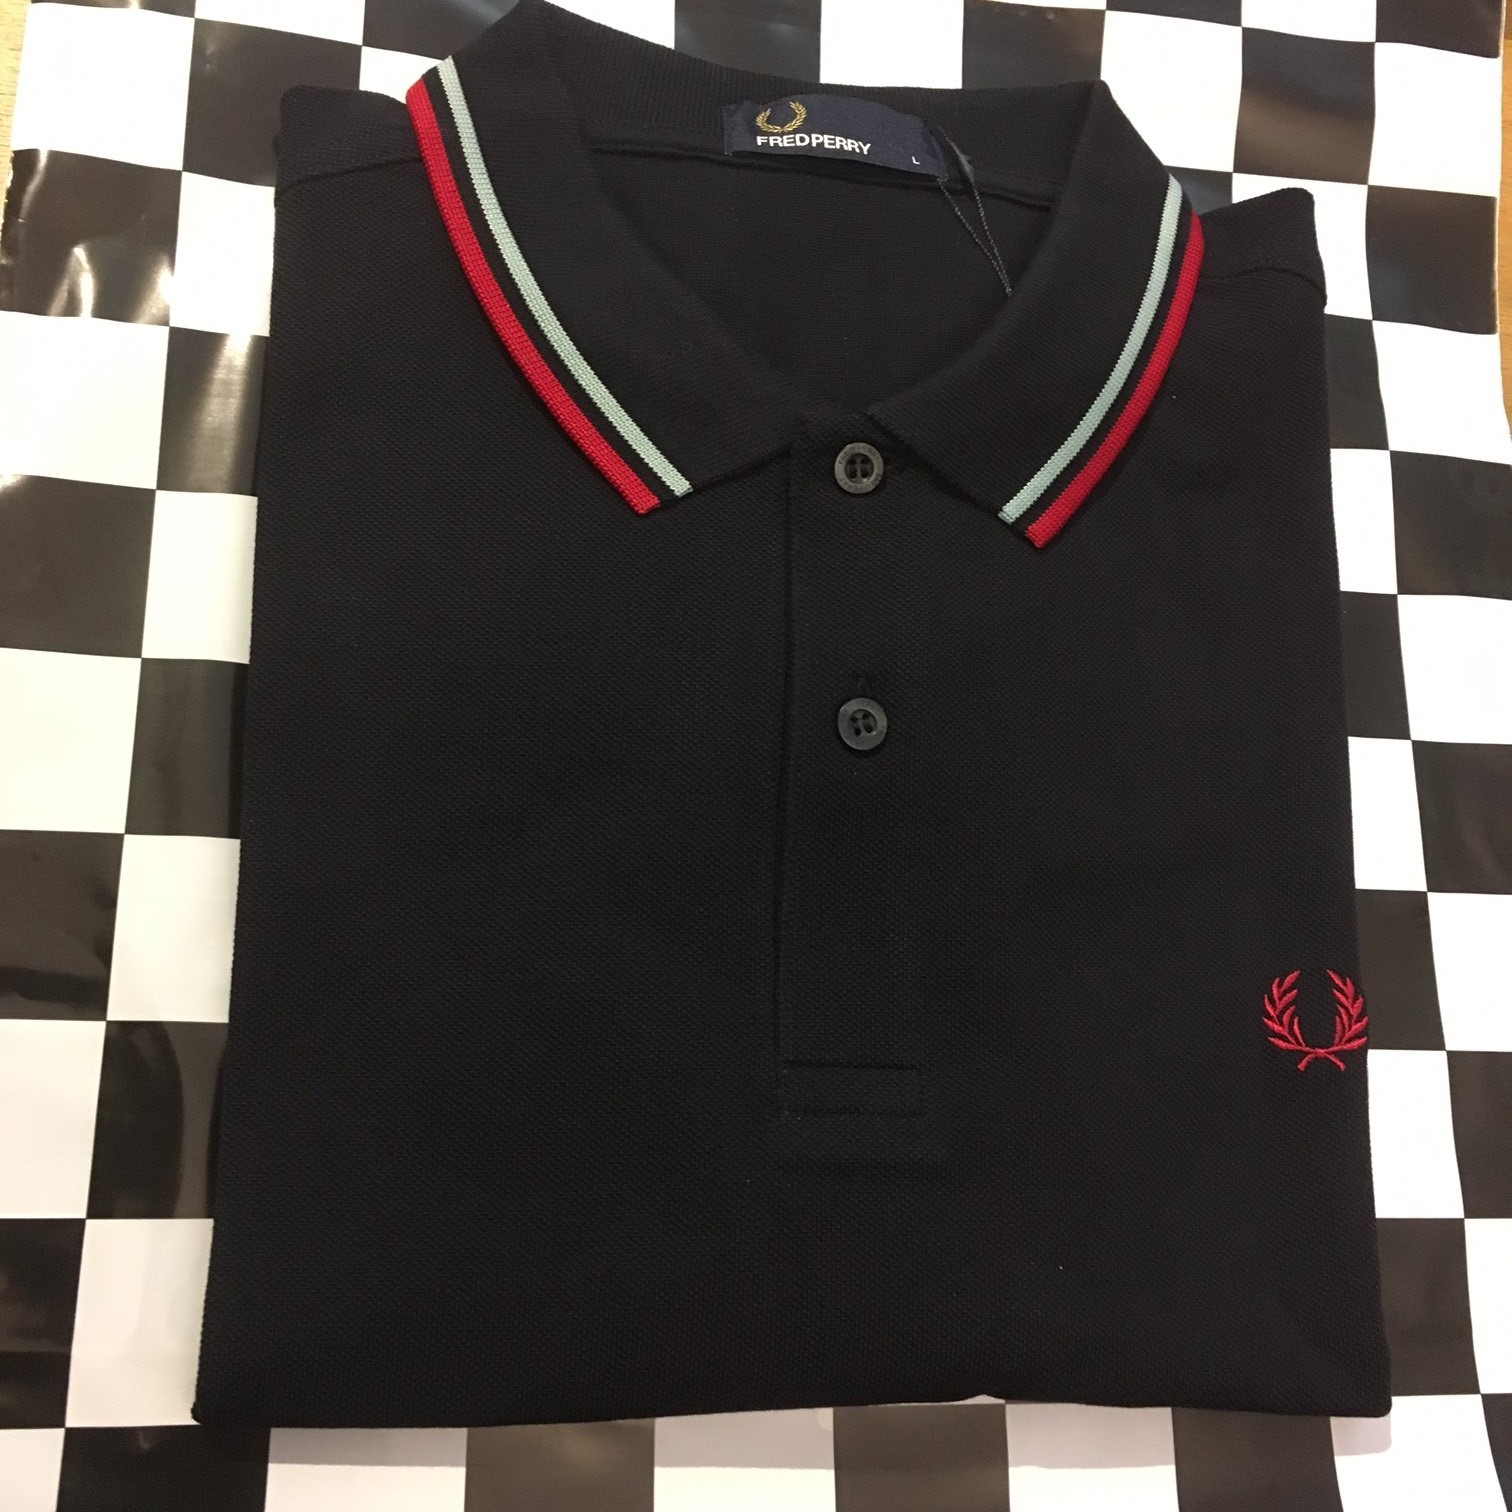 a0b5f882 Fred Perry Twin Tipped Polo Shirt Navy/Mint/Terra - Rockawaybeach